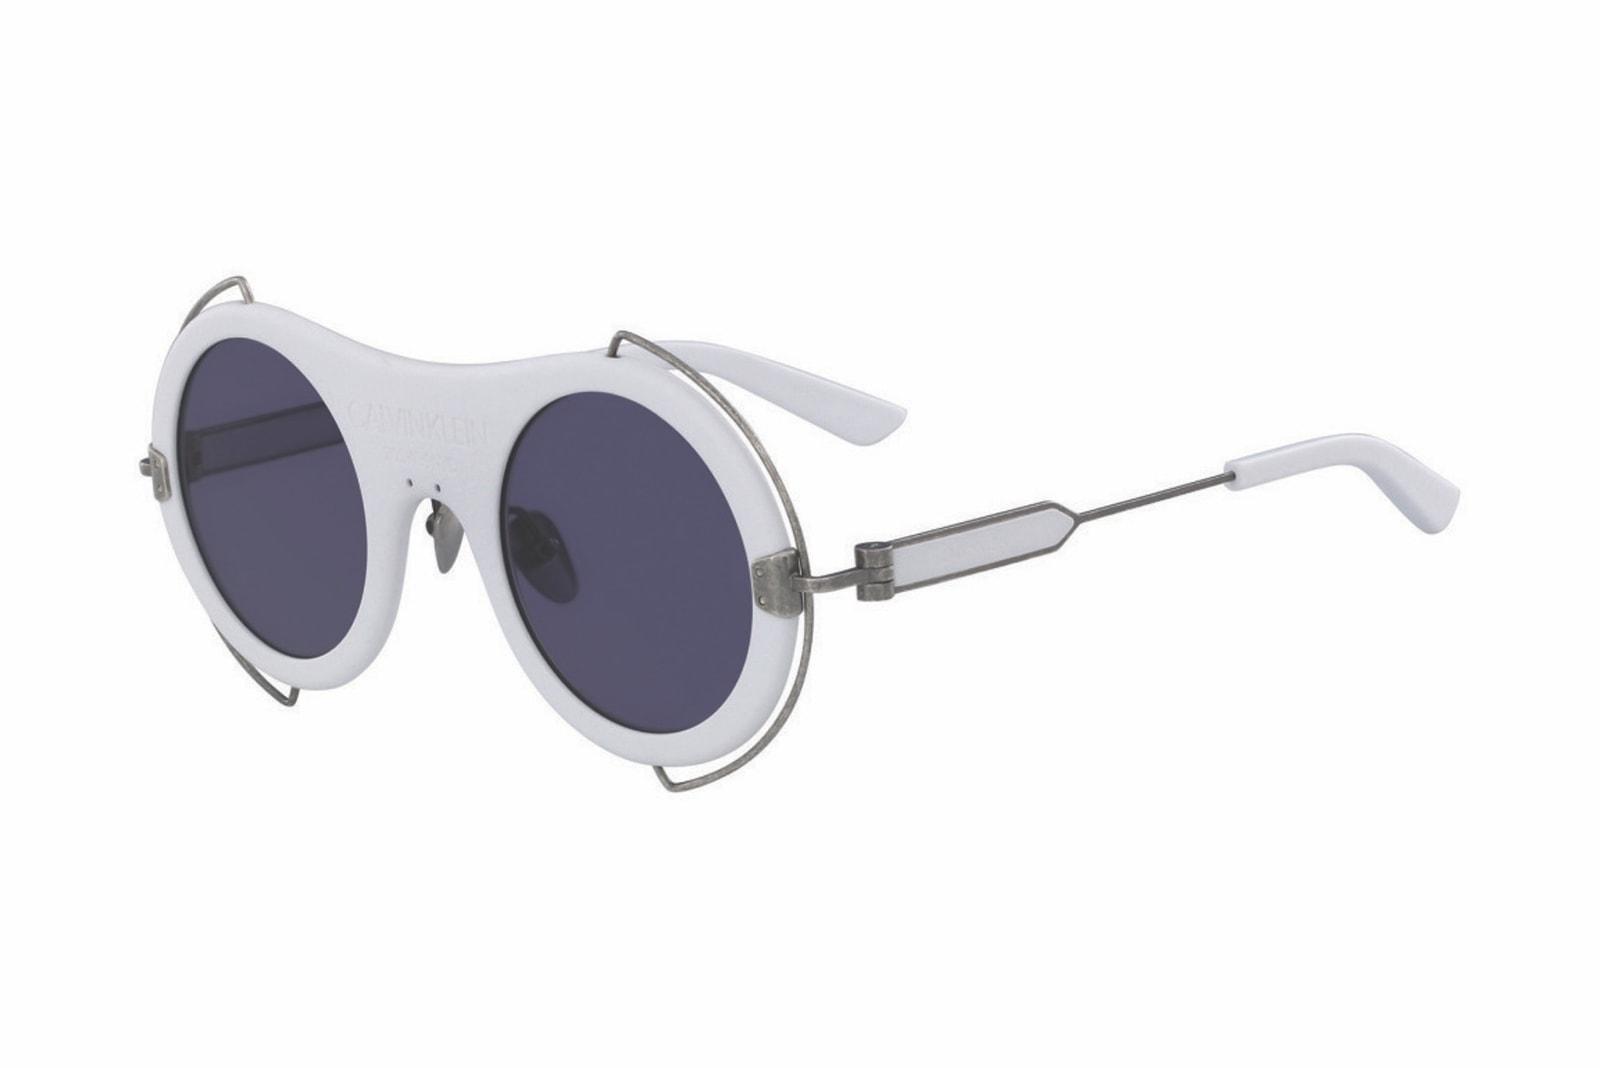 Calvin Klein 205W39NYC SS18 Eyewear Collection Raf Simons CK Sunglasses Accessories Calvin Klein Jeans Rebrand